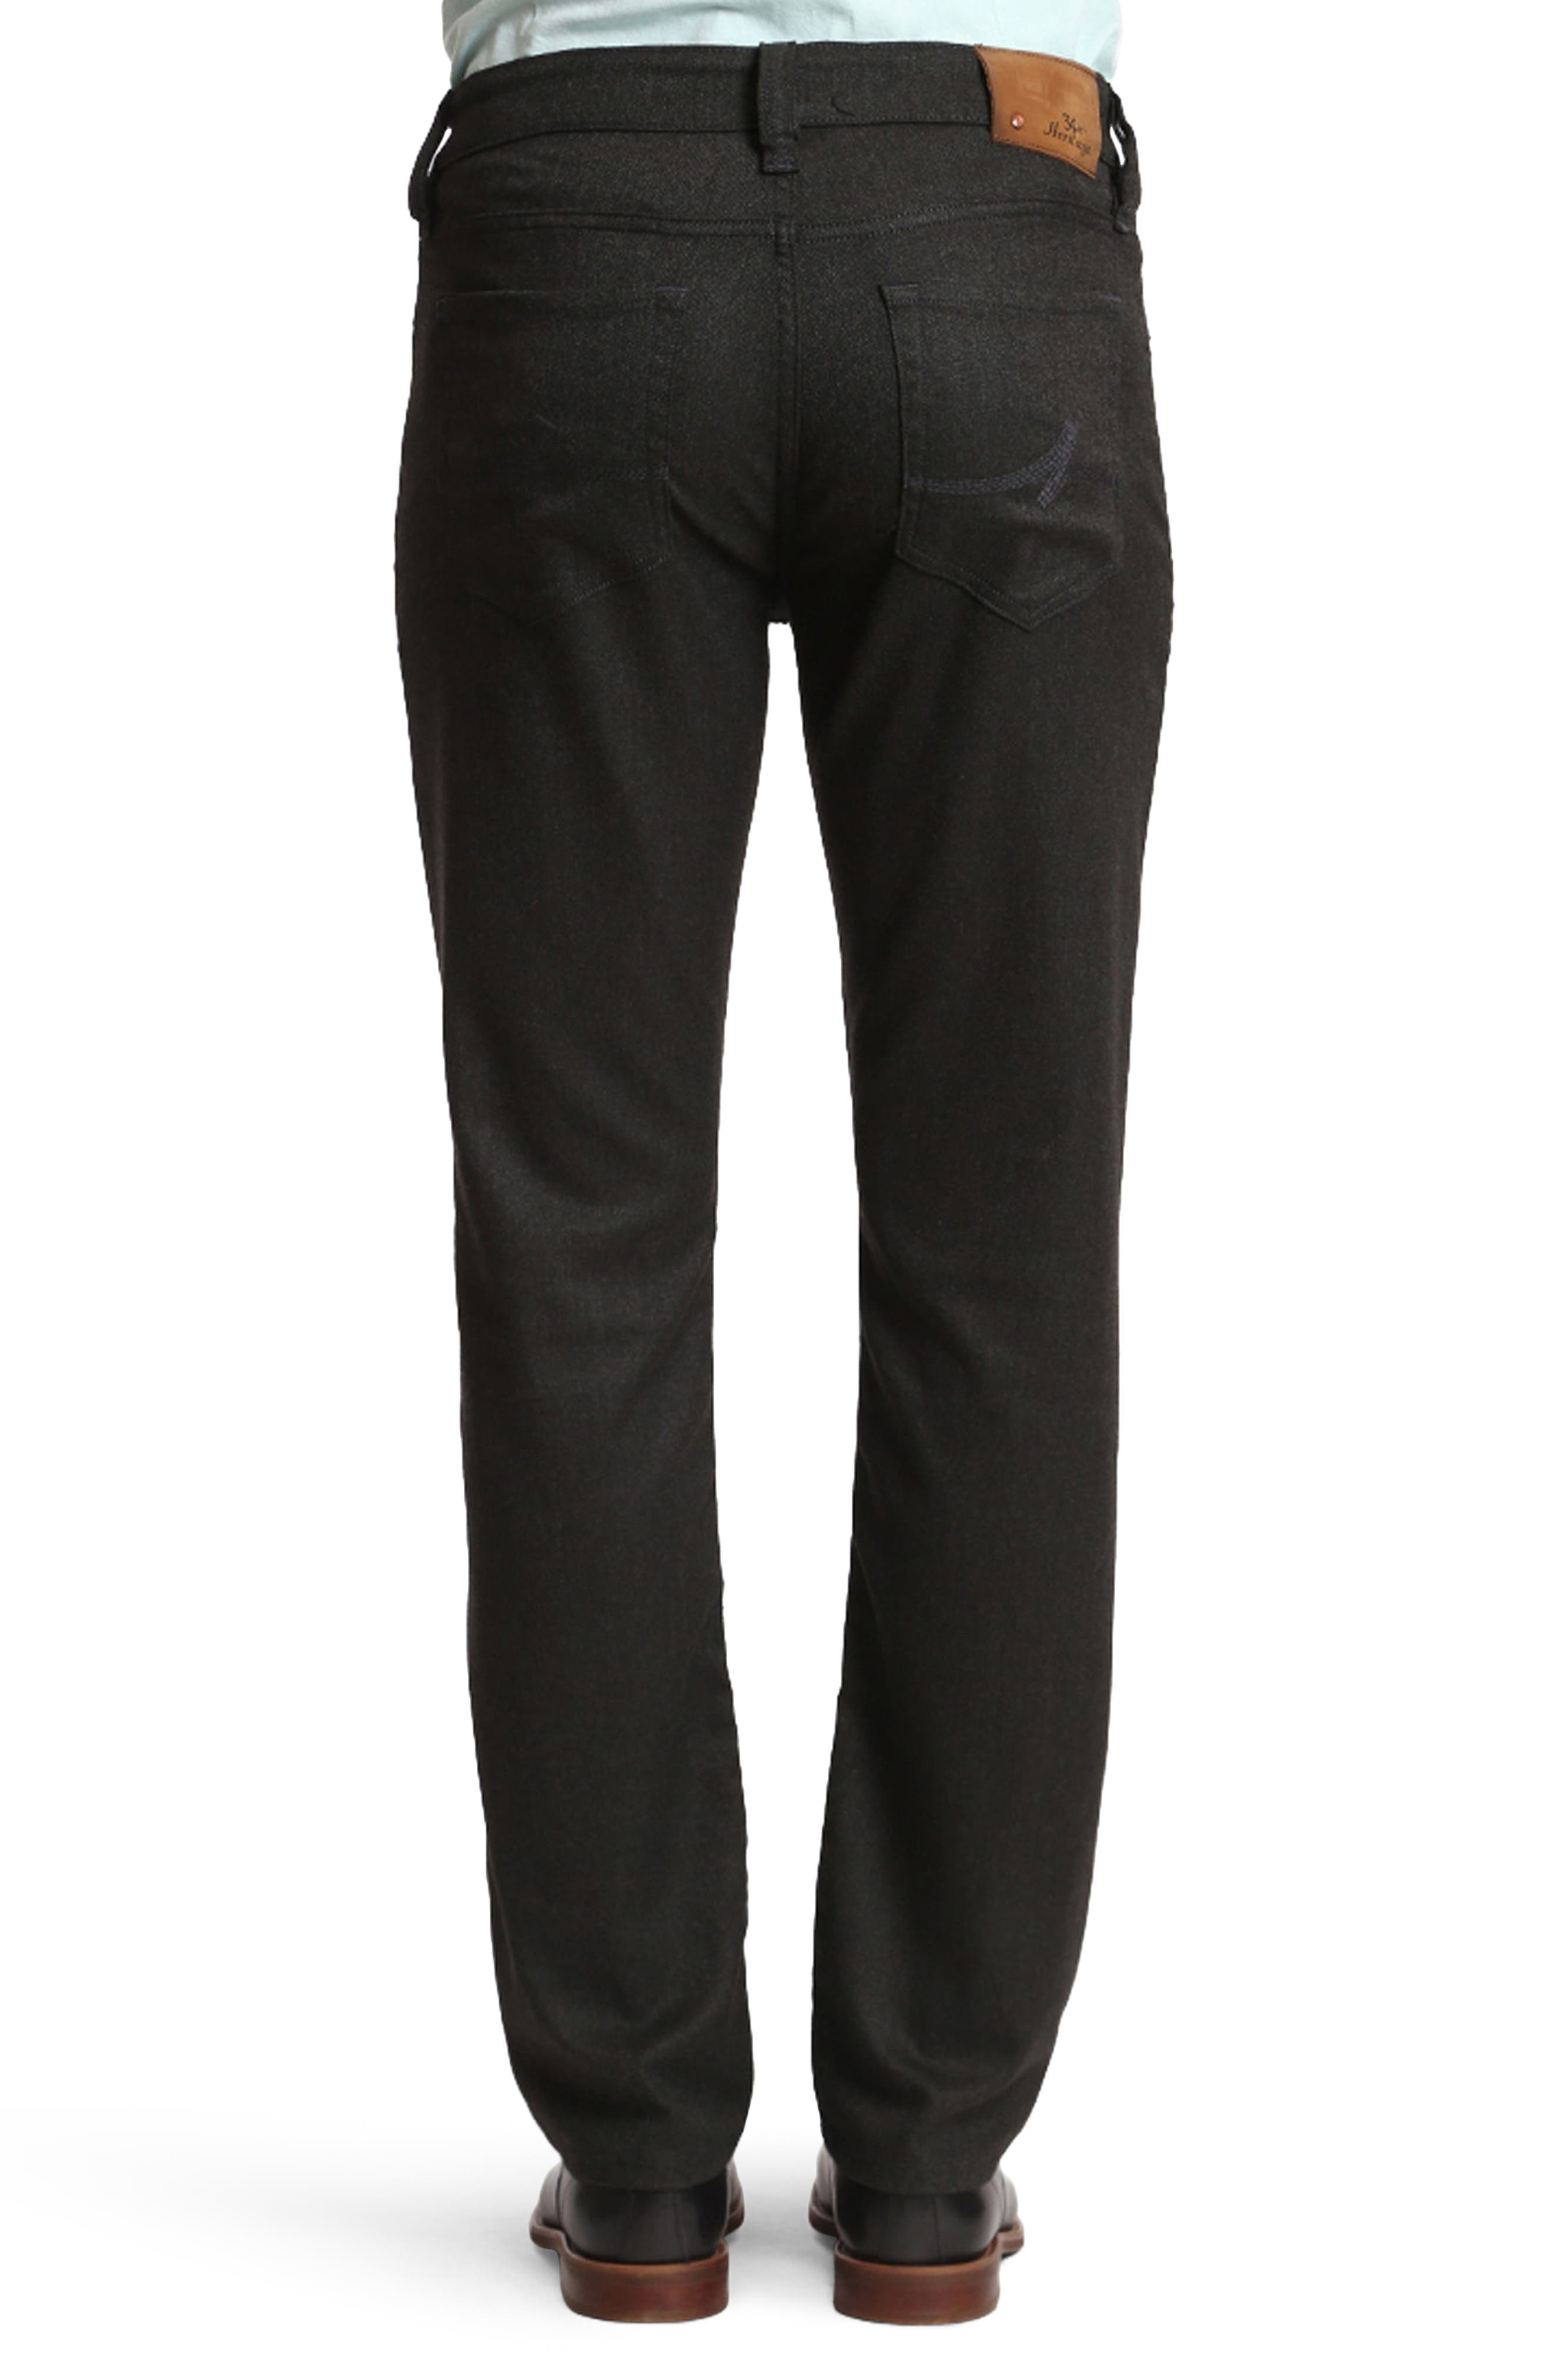 Courage Straight Leg Tweed Pants,                             Alternate thumbnail 2, color,                             401